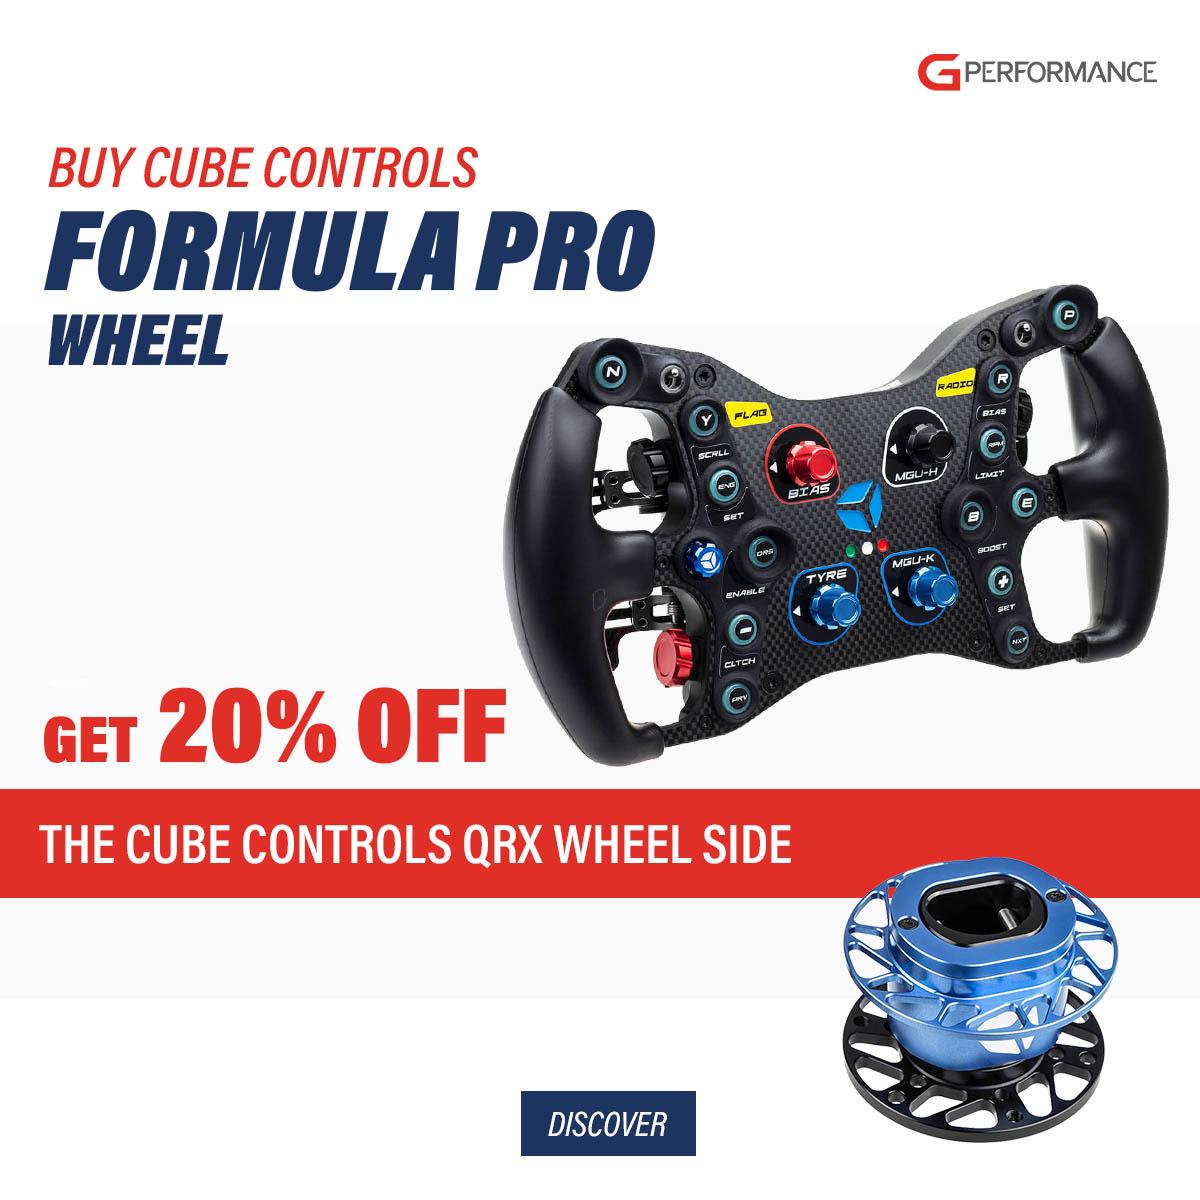 Cube Controls Formula Pro USB + QRX wheel side bundle discount - G-Performance